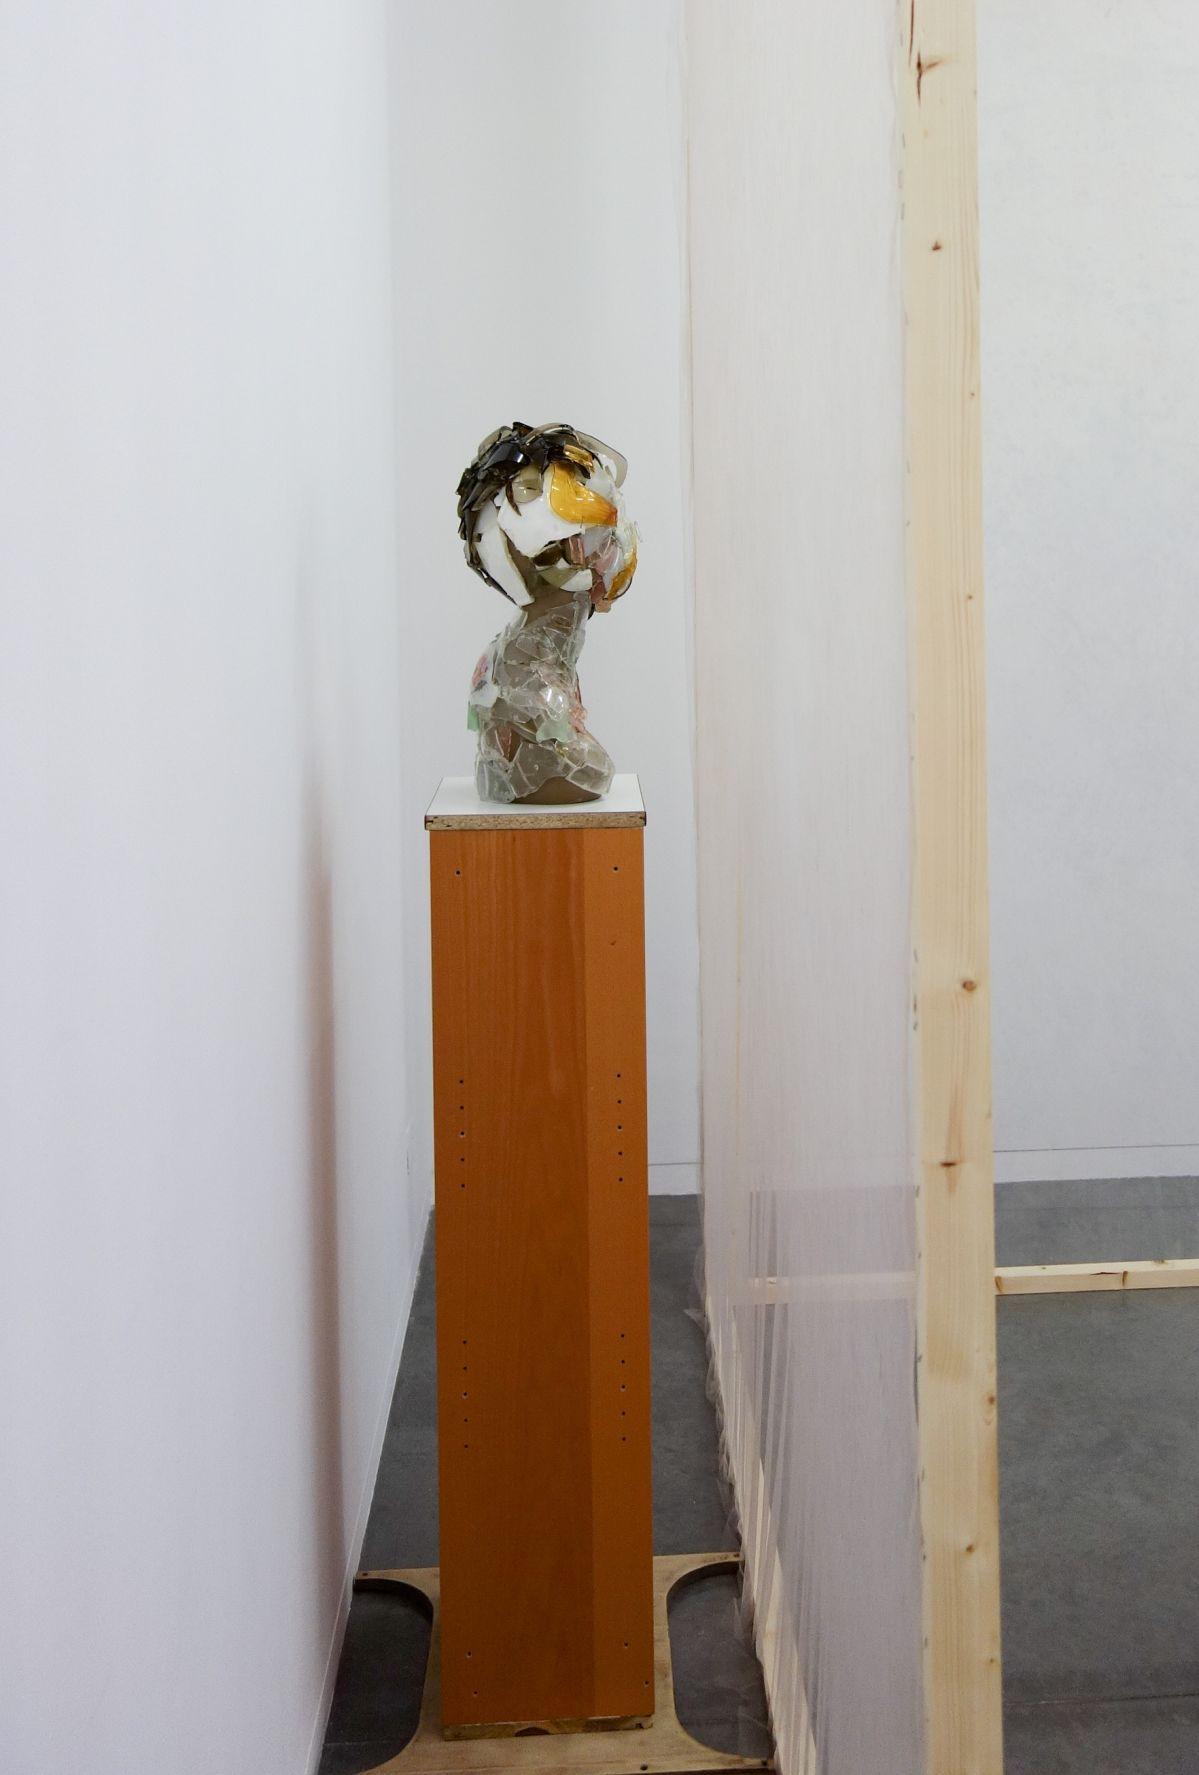 Nick Devereux en collaboration avec Wilfrid Almendra - In the Round, 2018 - Mrac Sérignan - Accrochage des collections 2019-2020